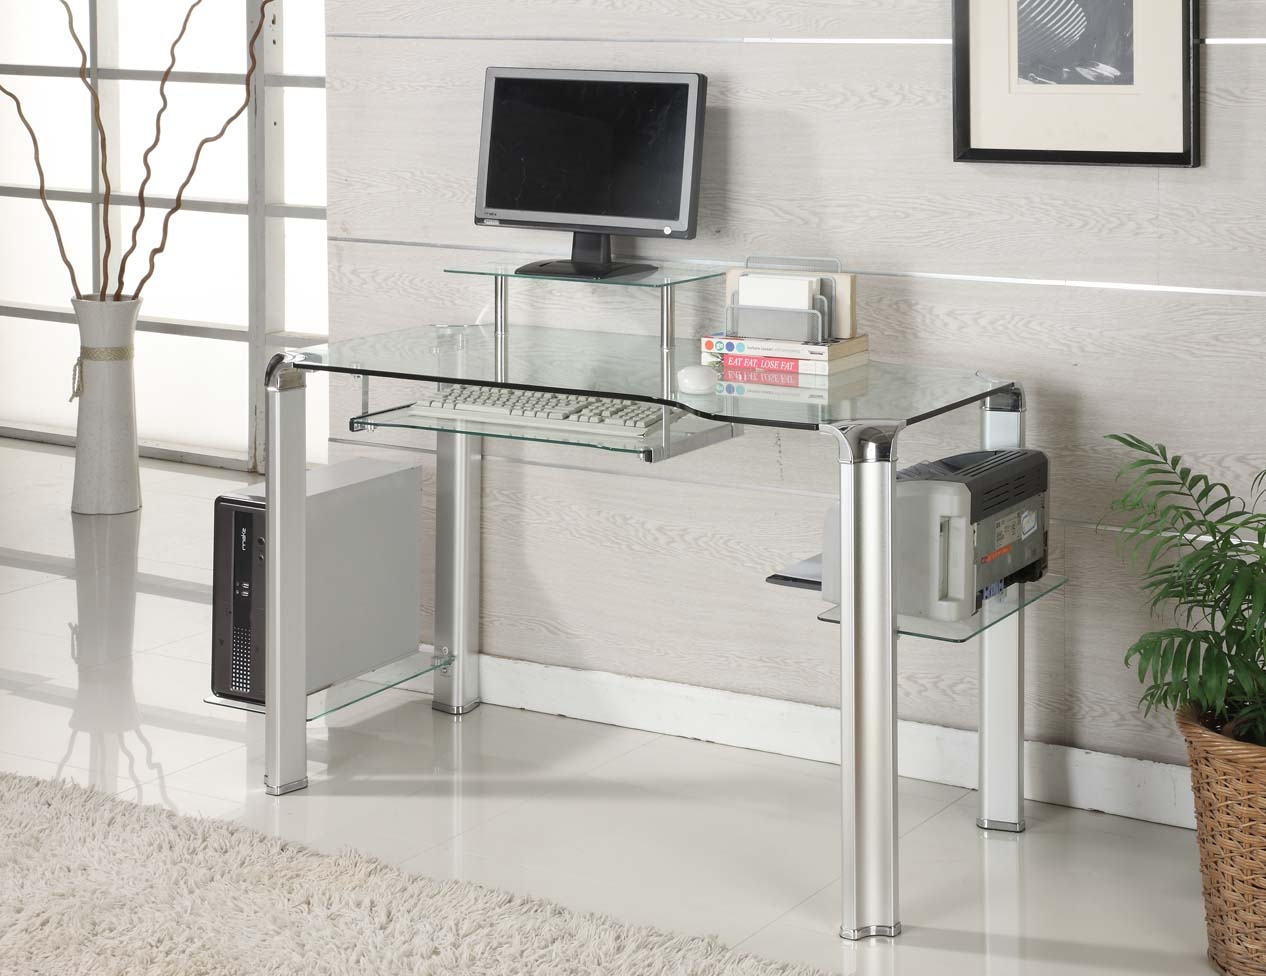 Innovex-Innovex-Clear-Glass-Computer-Desk-Computer-Desk_0_0.jpg